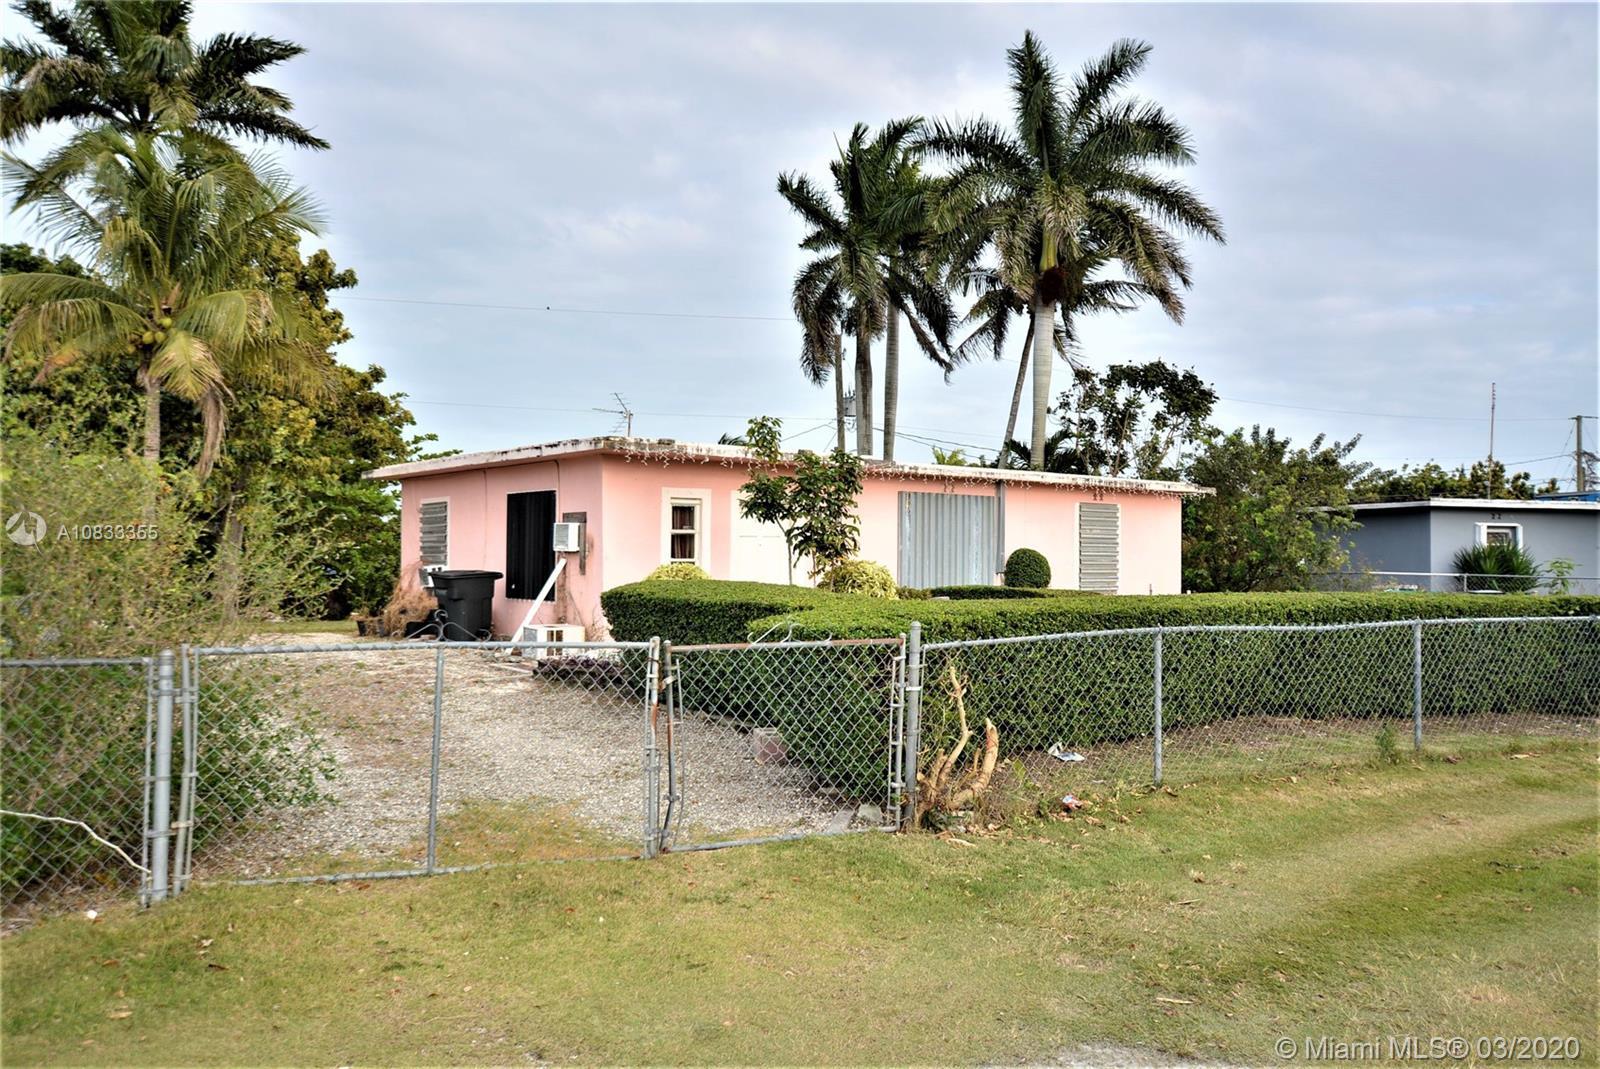 29421 Idaho Rd, Homestead, FL 33033 - Homestead, FL real estate listing